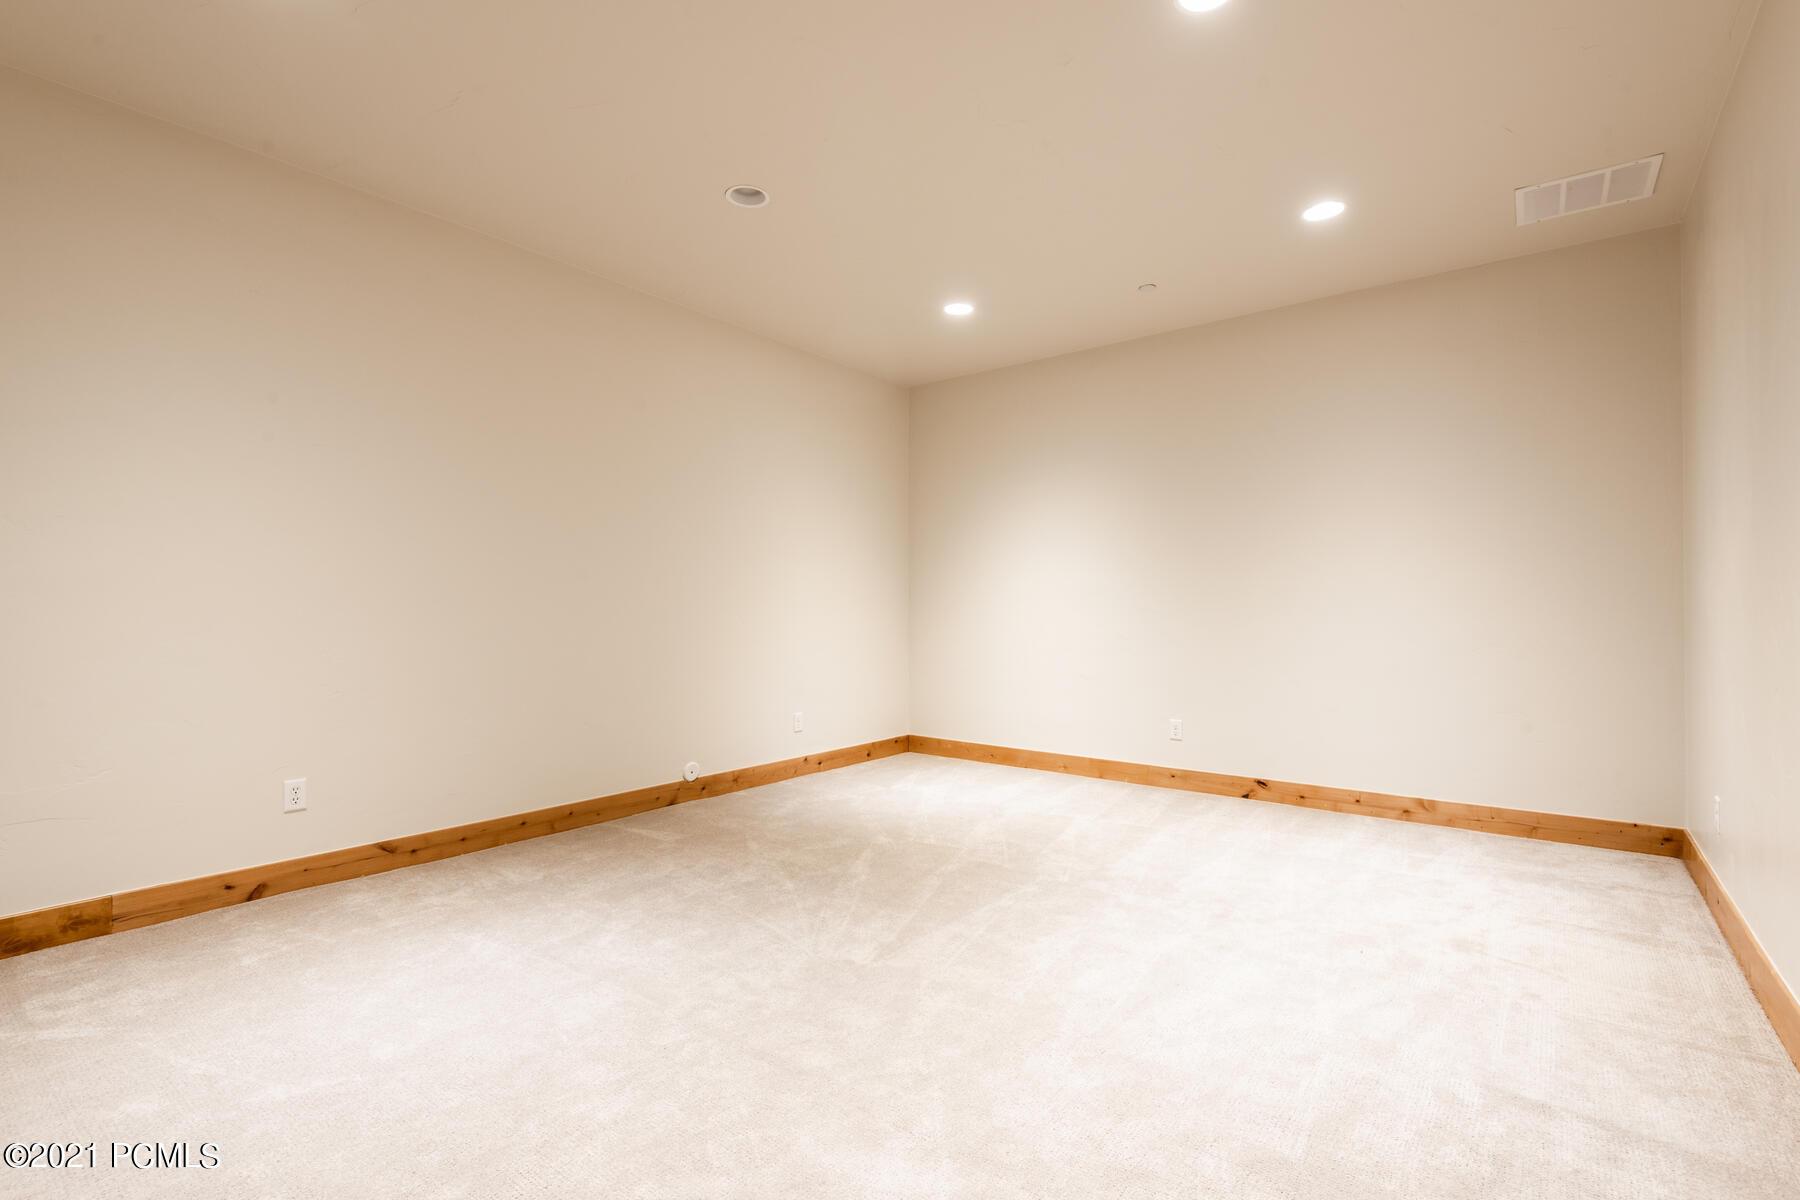 2490 Silver Cloud Drive, Park City, Utah 84060, 5 Bedrooms Bedrooms, ,6 BathroomsBathrooms,Single Family,For Sale,Silver Cloud,12100692